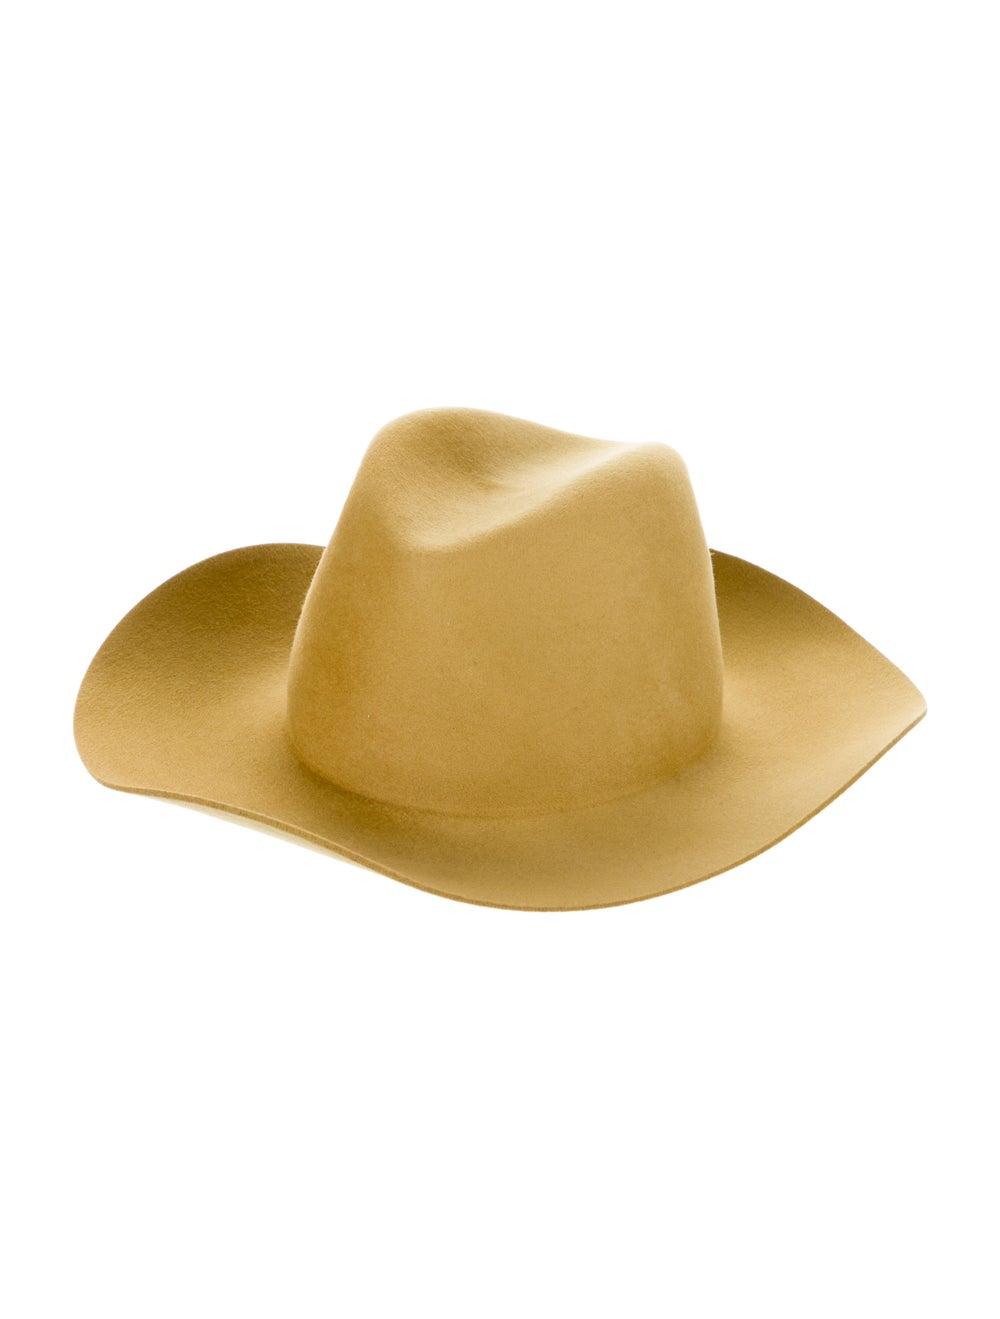 Janessa Leone Wool Fedora Hat Yellow - image 1